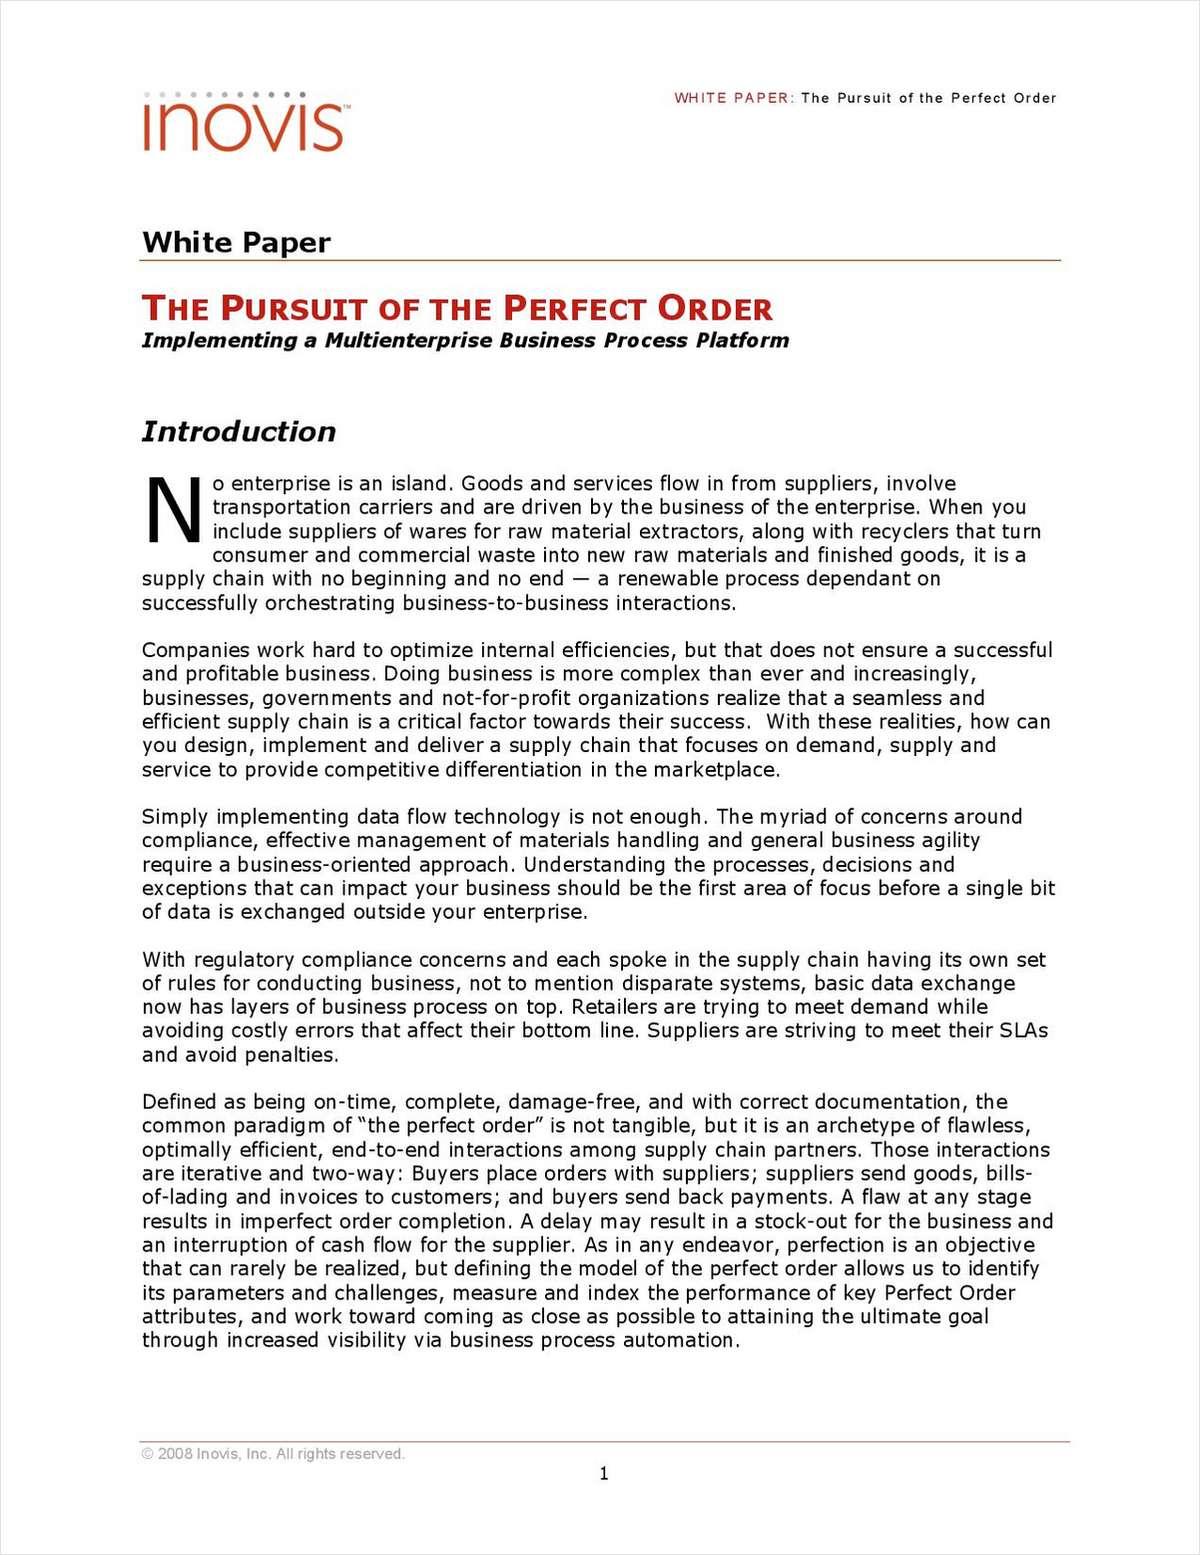 The Pursuit of the Perfect Order: Implementing a Multienterprise Business Process Platform